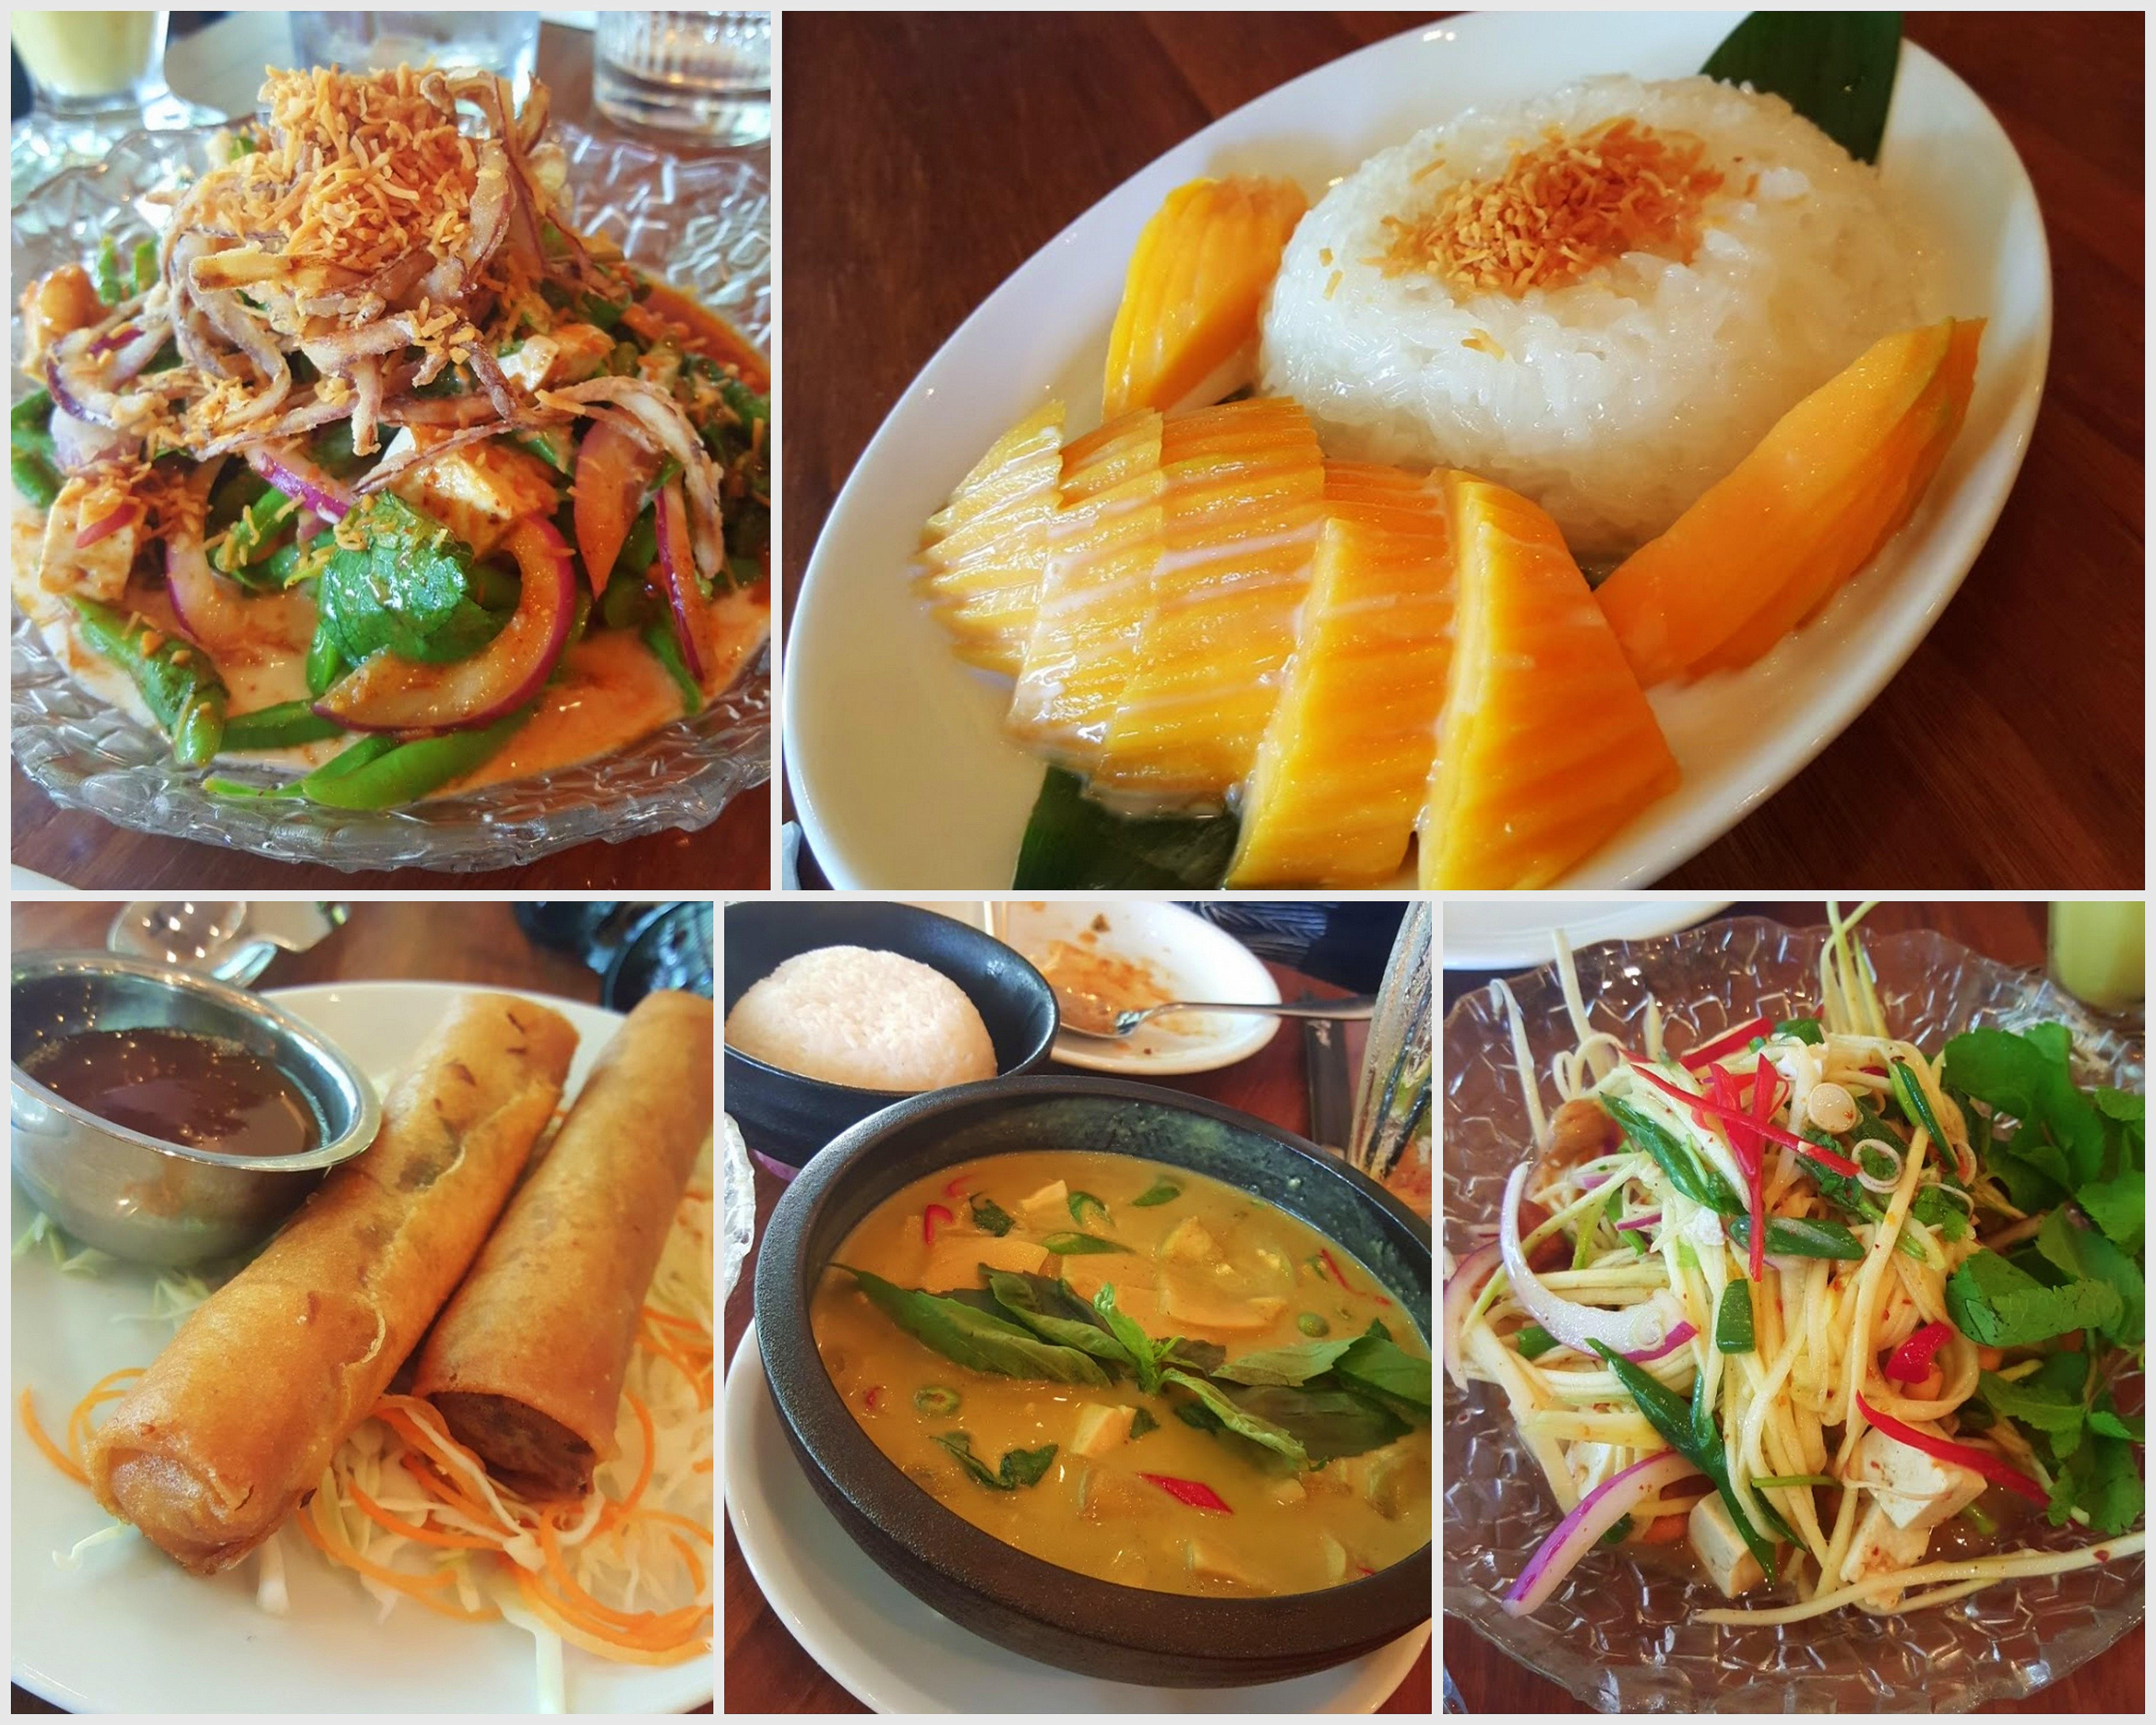 NAM מסעדה תאילנדית עם אופציות טבעוניות וצמחוניות